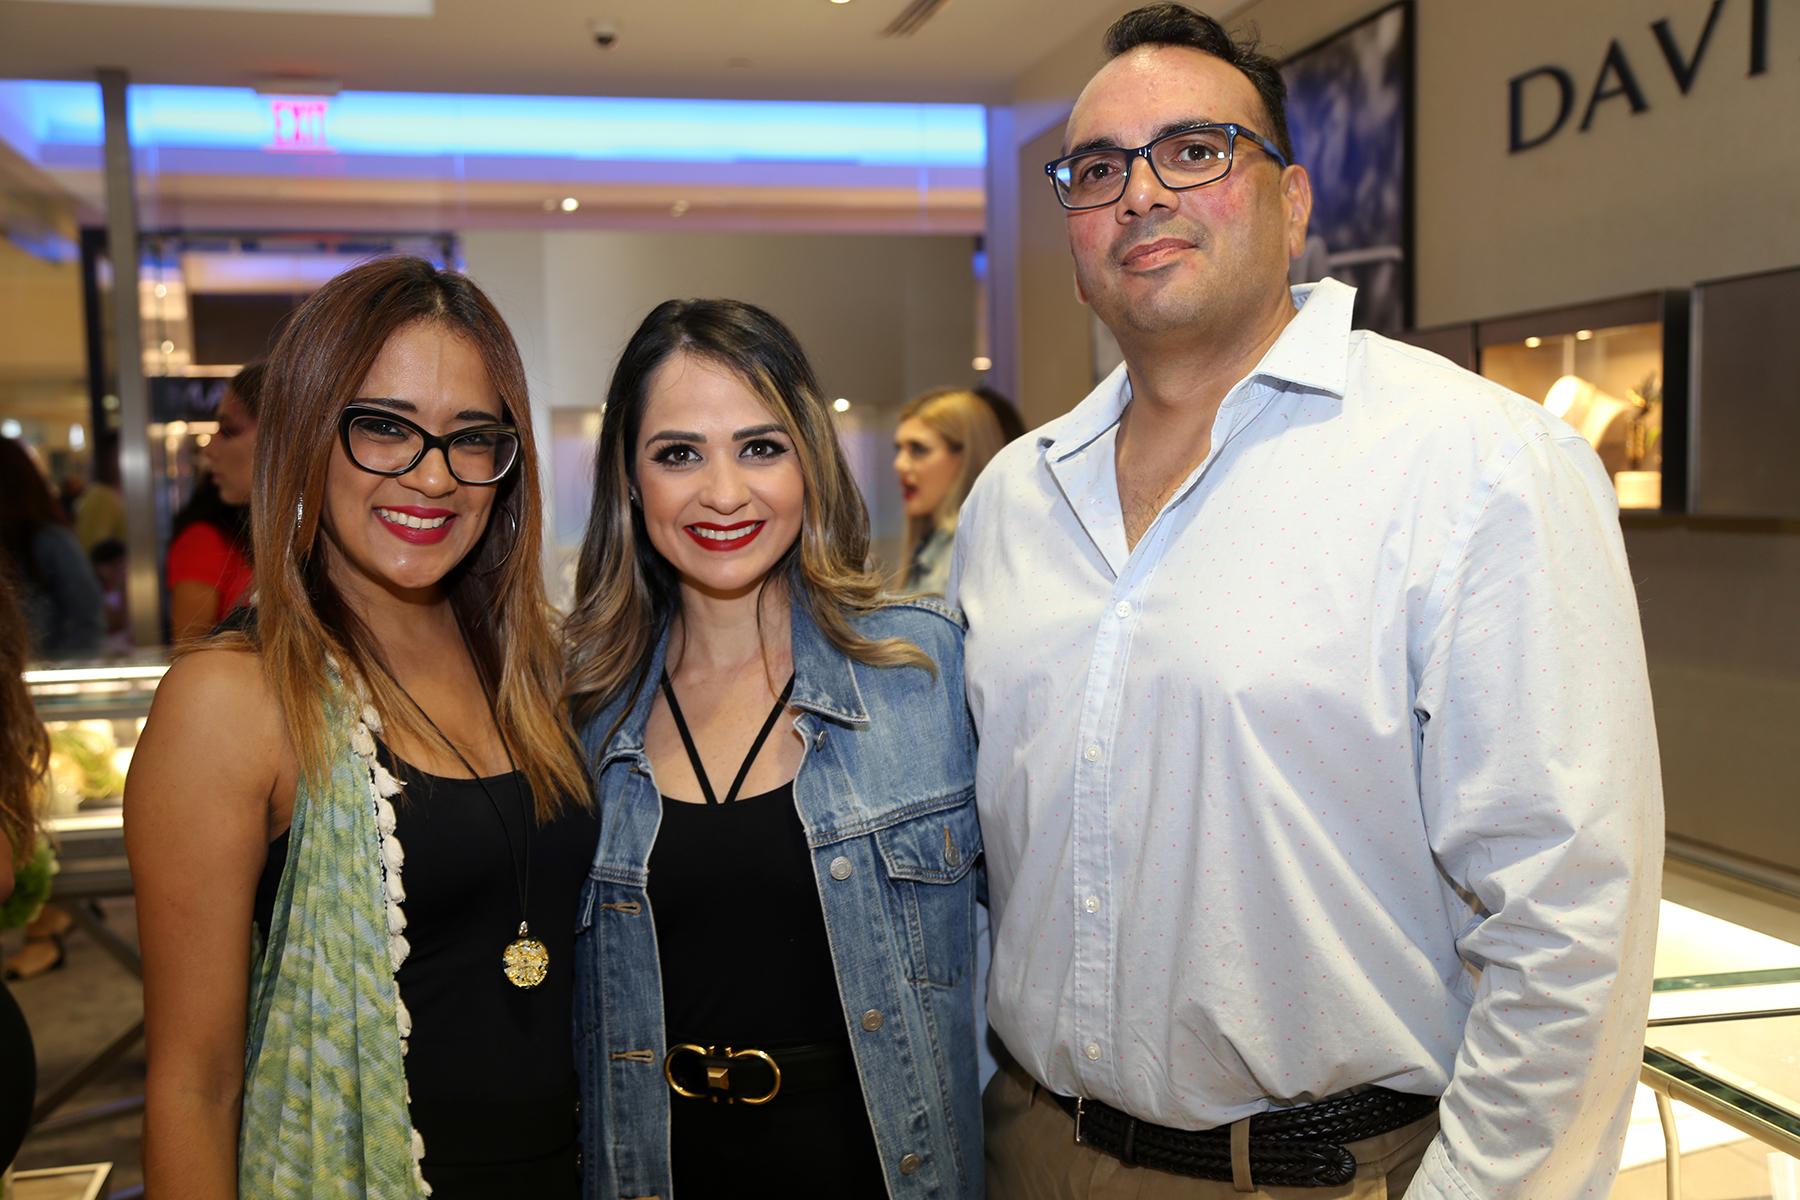 Vanessa Rivera, Wilnahir Báez, Ivan Girona. (Nichole Saldarriaga)